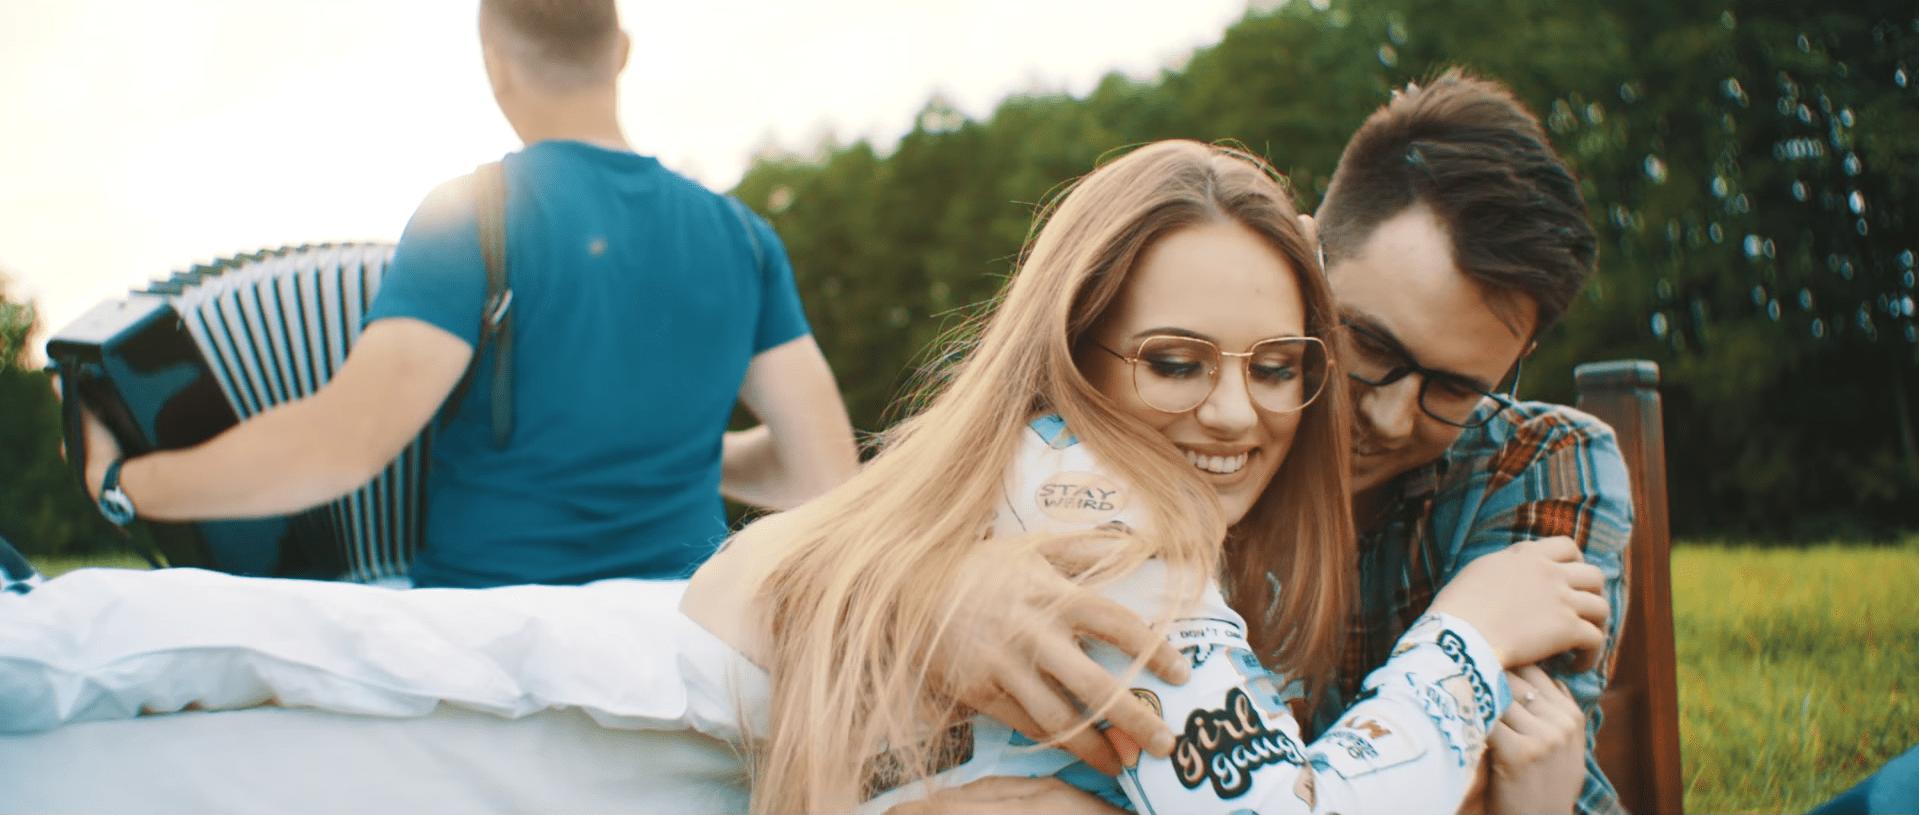 Teledysk| Alfa Boys – Będę Cię tulił 2018